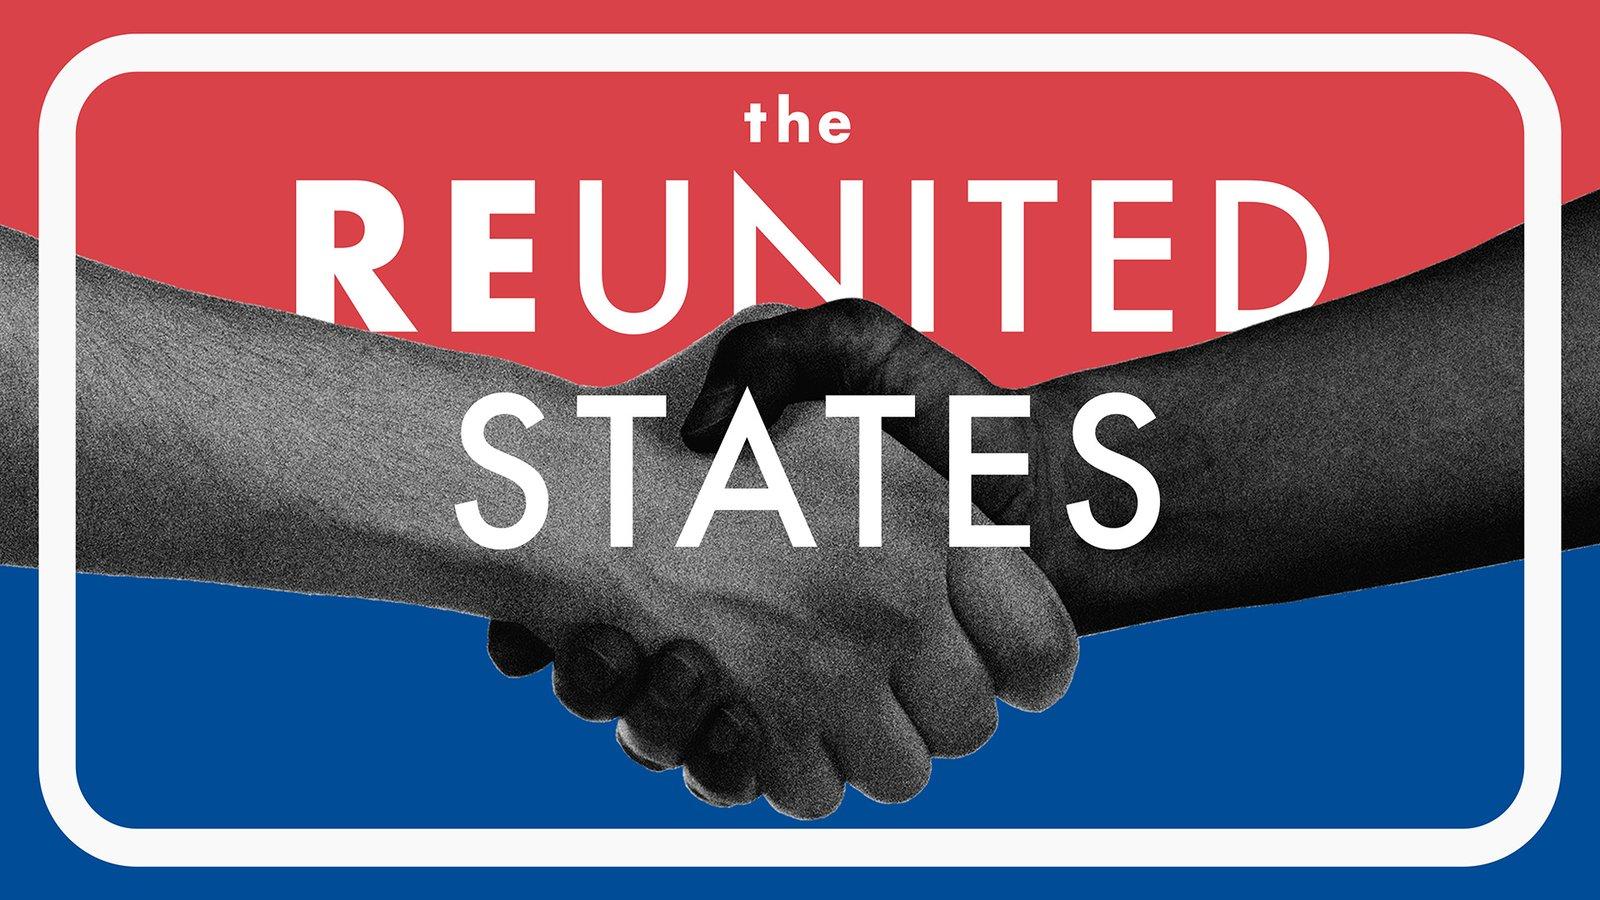 ReUnited States